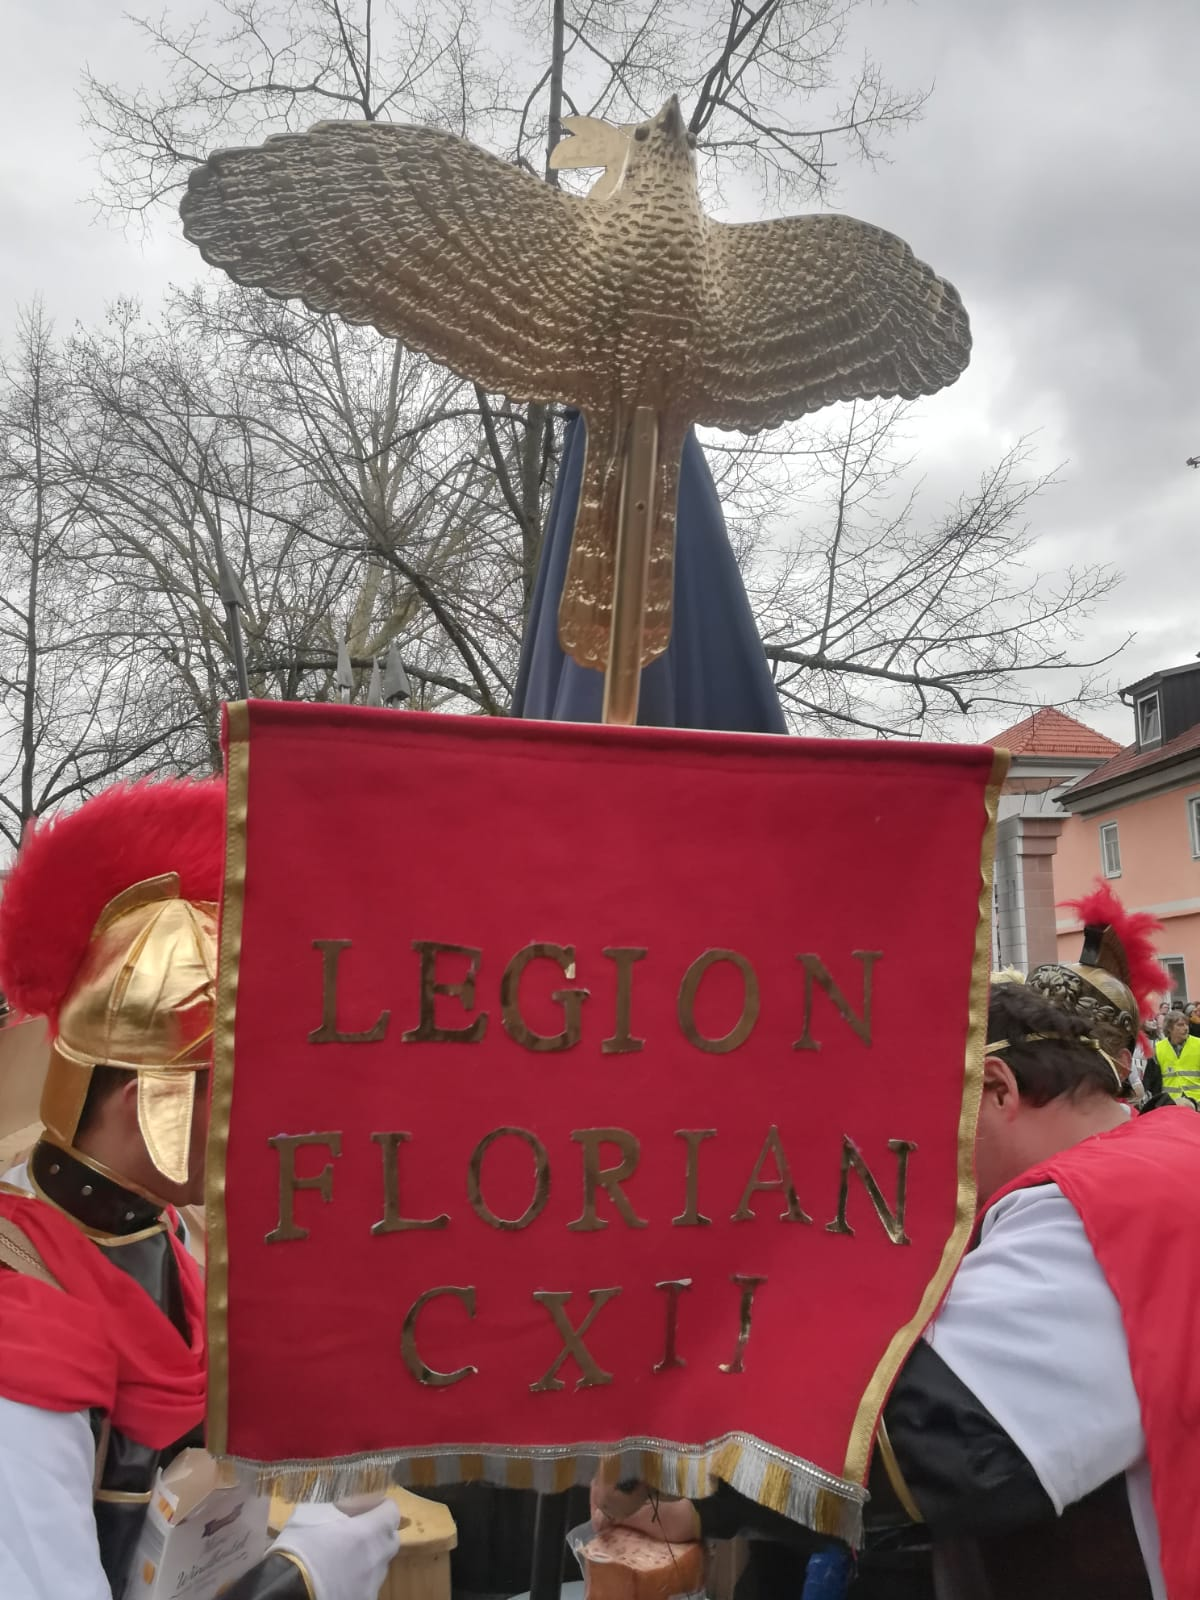 Legion Florian CXII